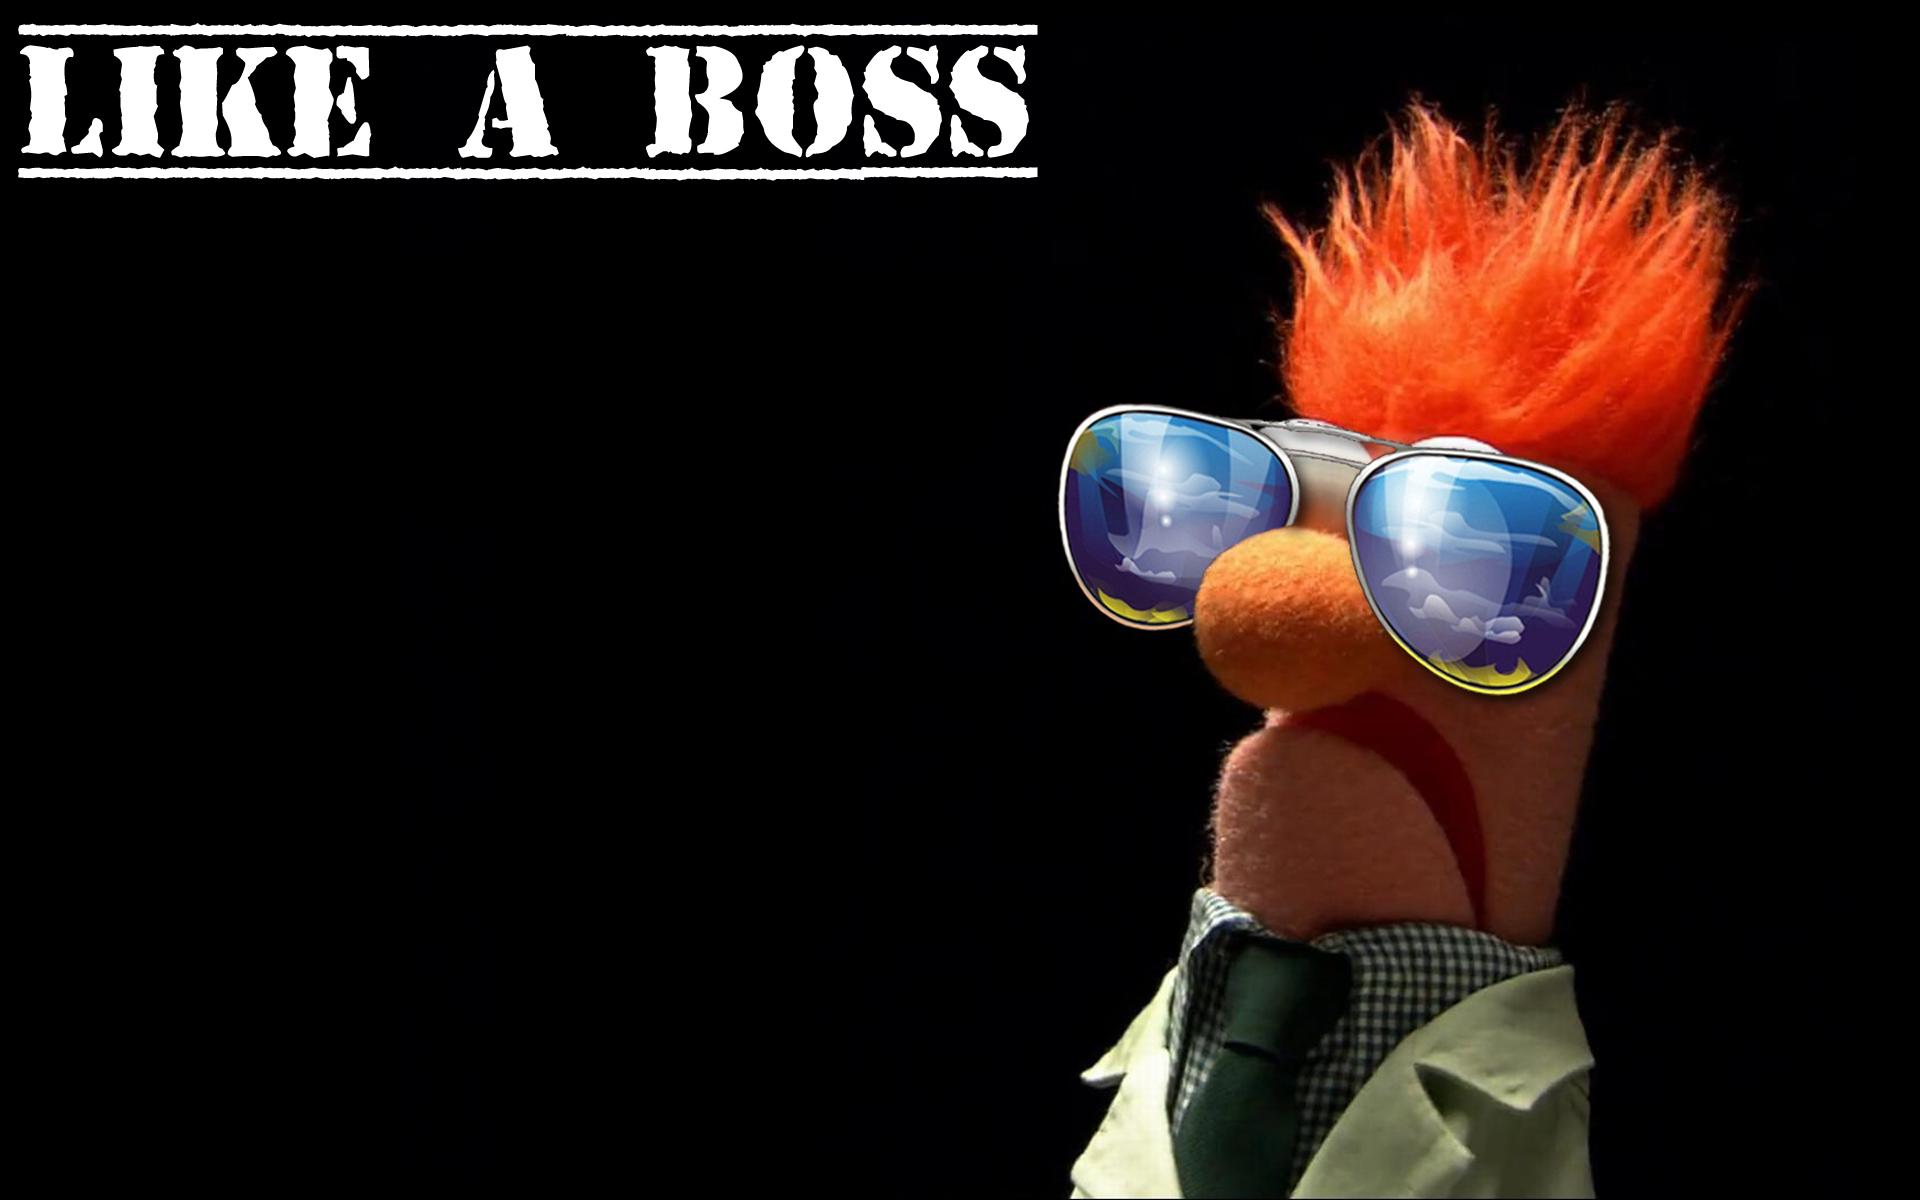 Beaker, The Muppet Show, like a boss - Free Wallpaper / WallpaperJam hdclipartall.com